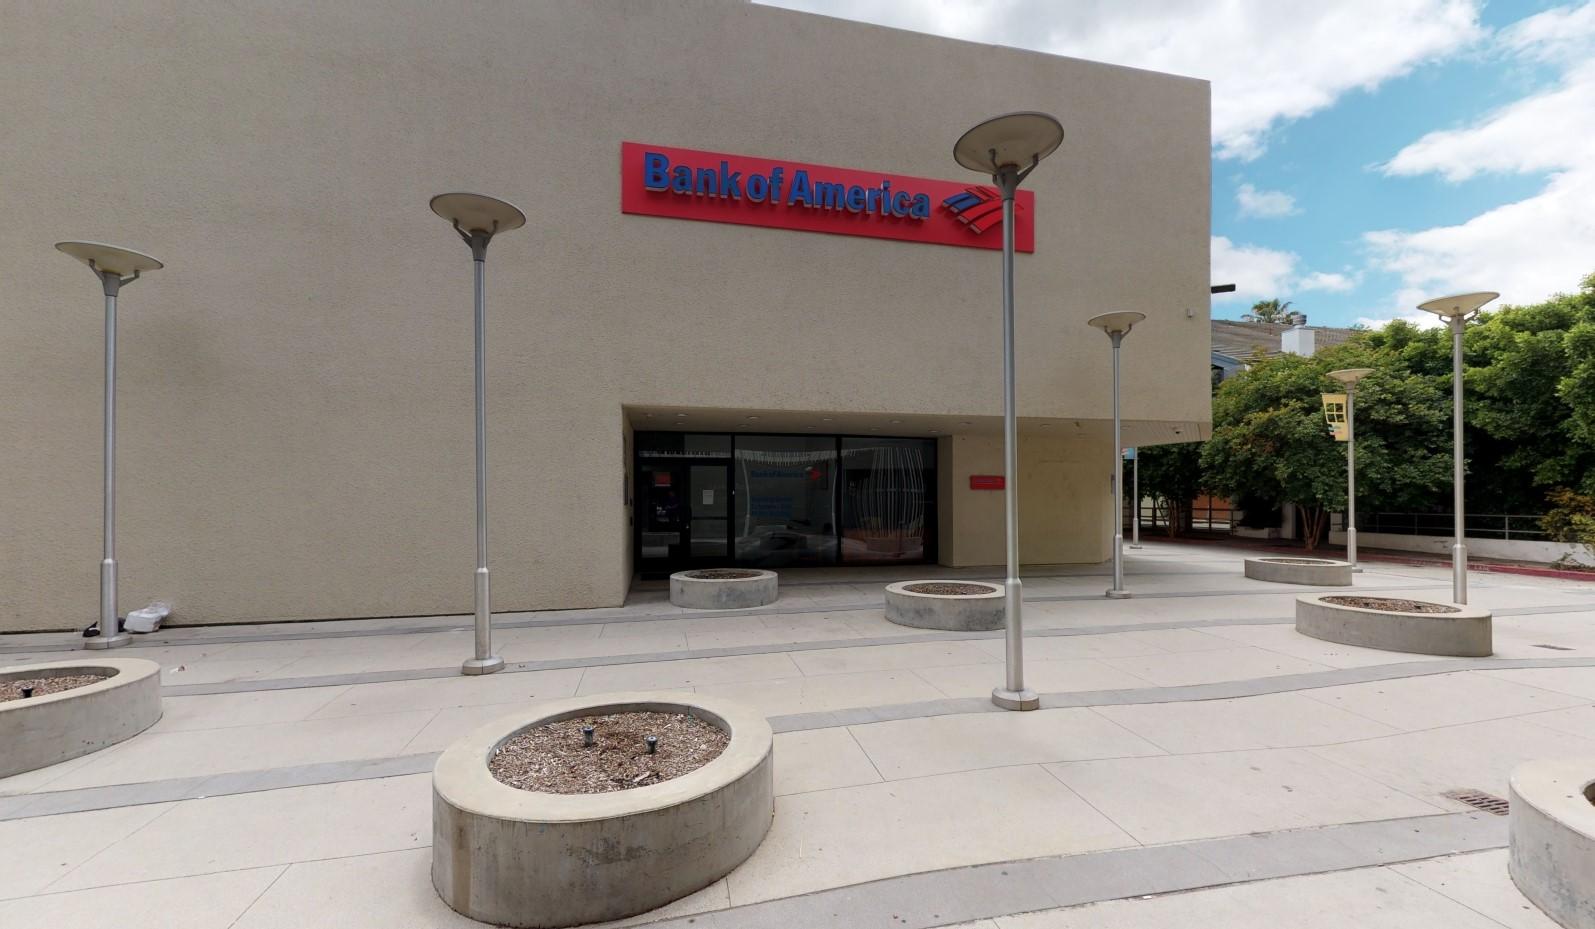 Bank of America financial center with walk-up ATM   12223 Ventura Blvd, Studio City, CA 91604